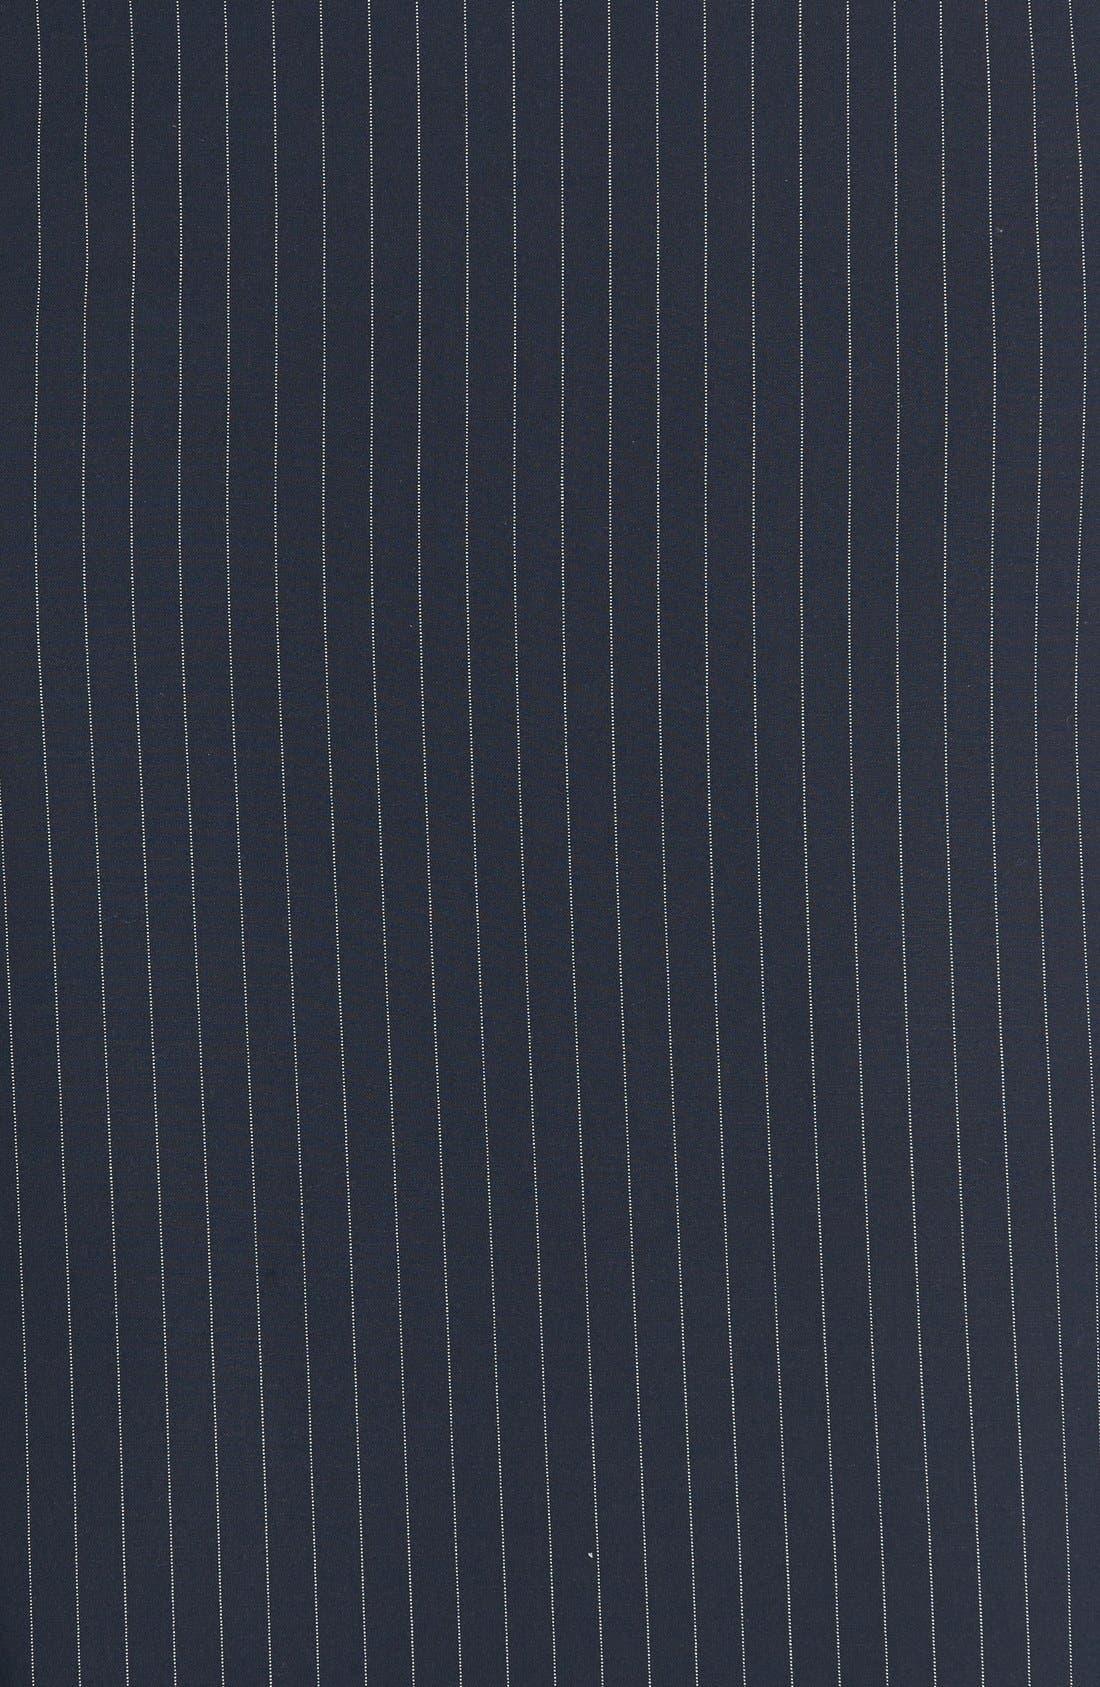 Alternate Image 3  - Jones New York 'Lucy' Pencil Skirt